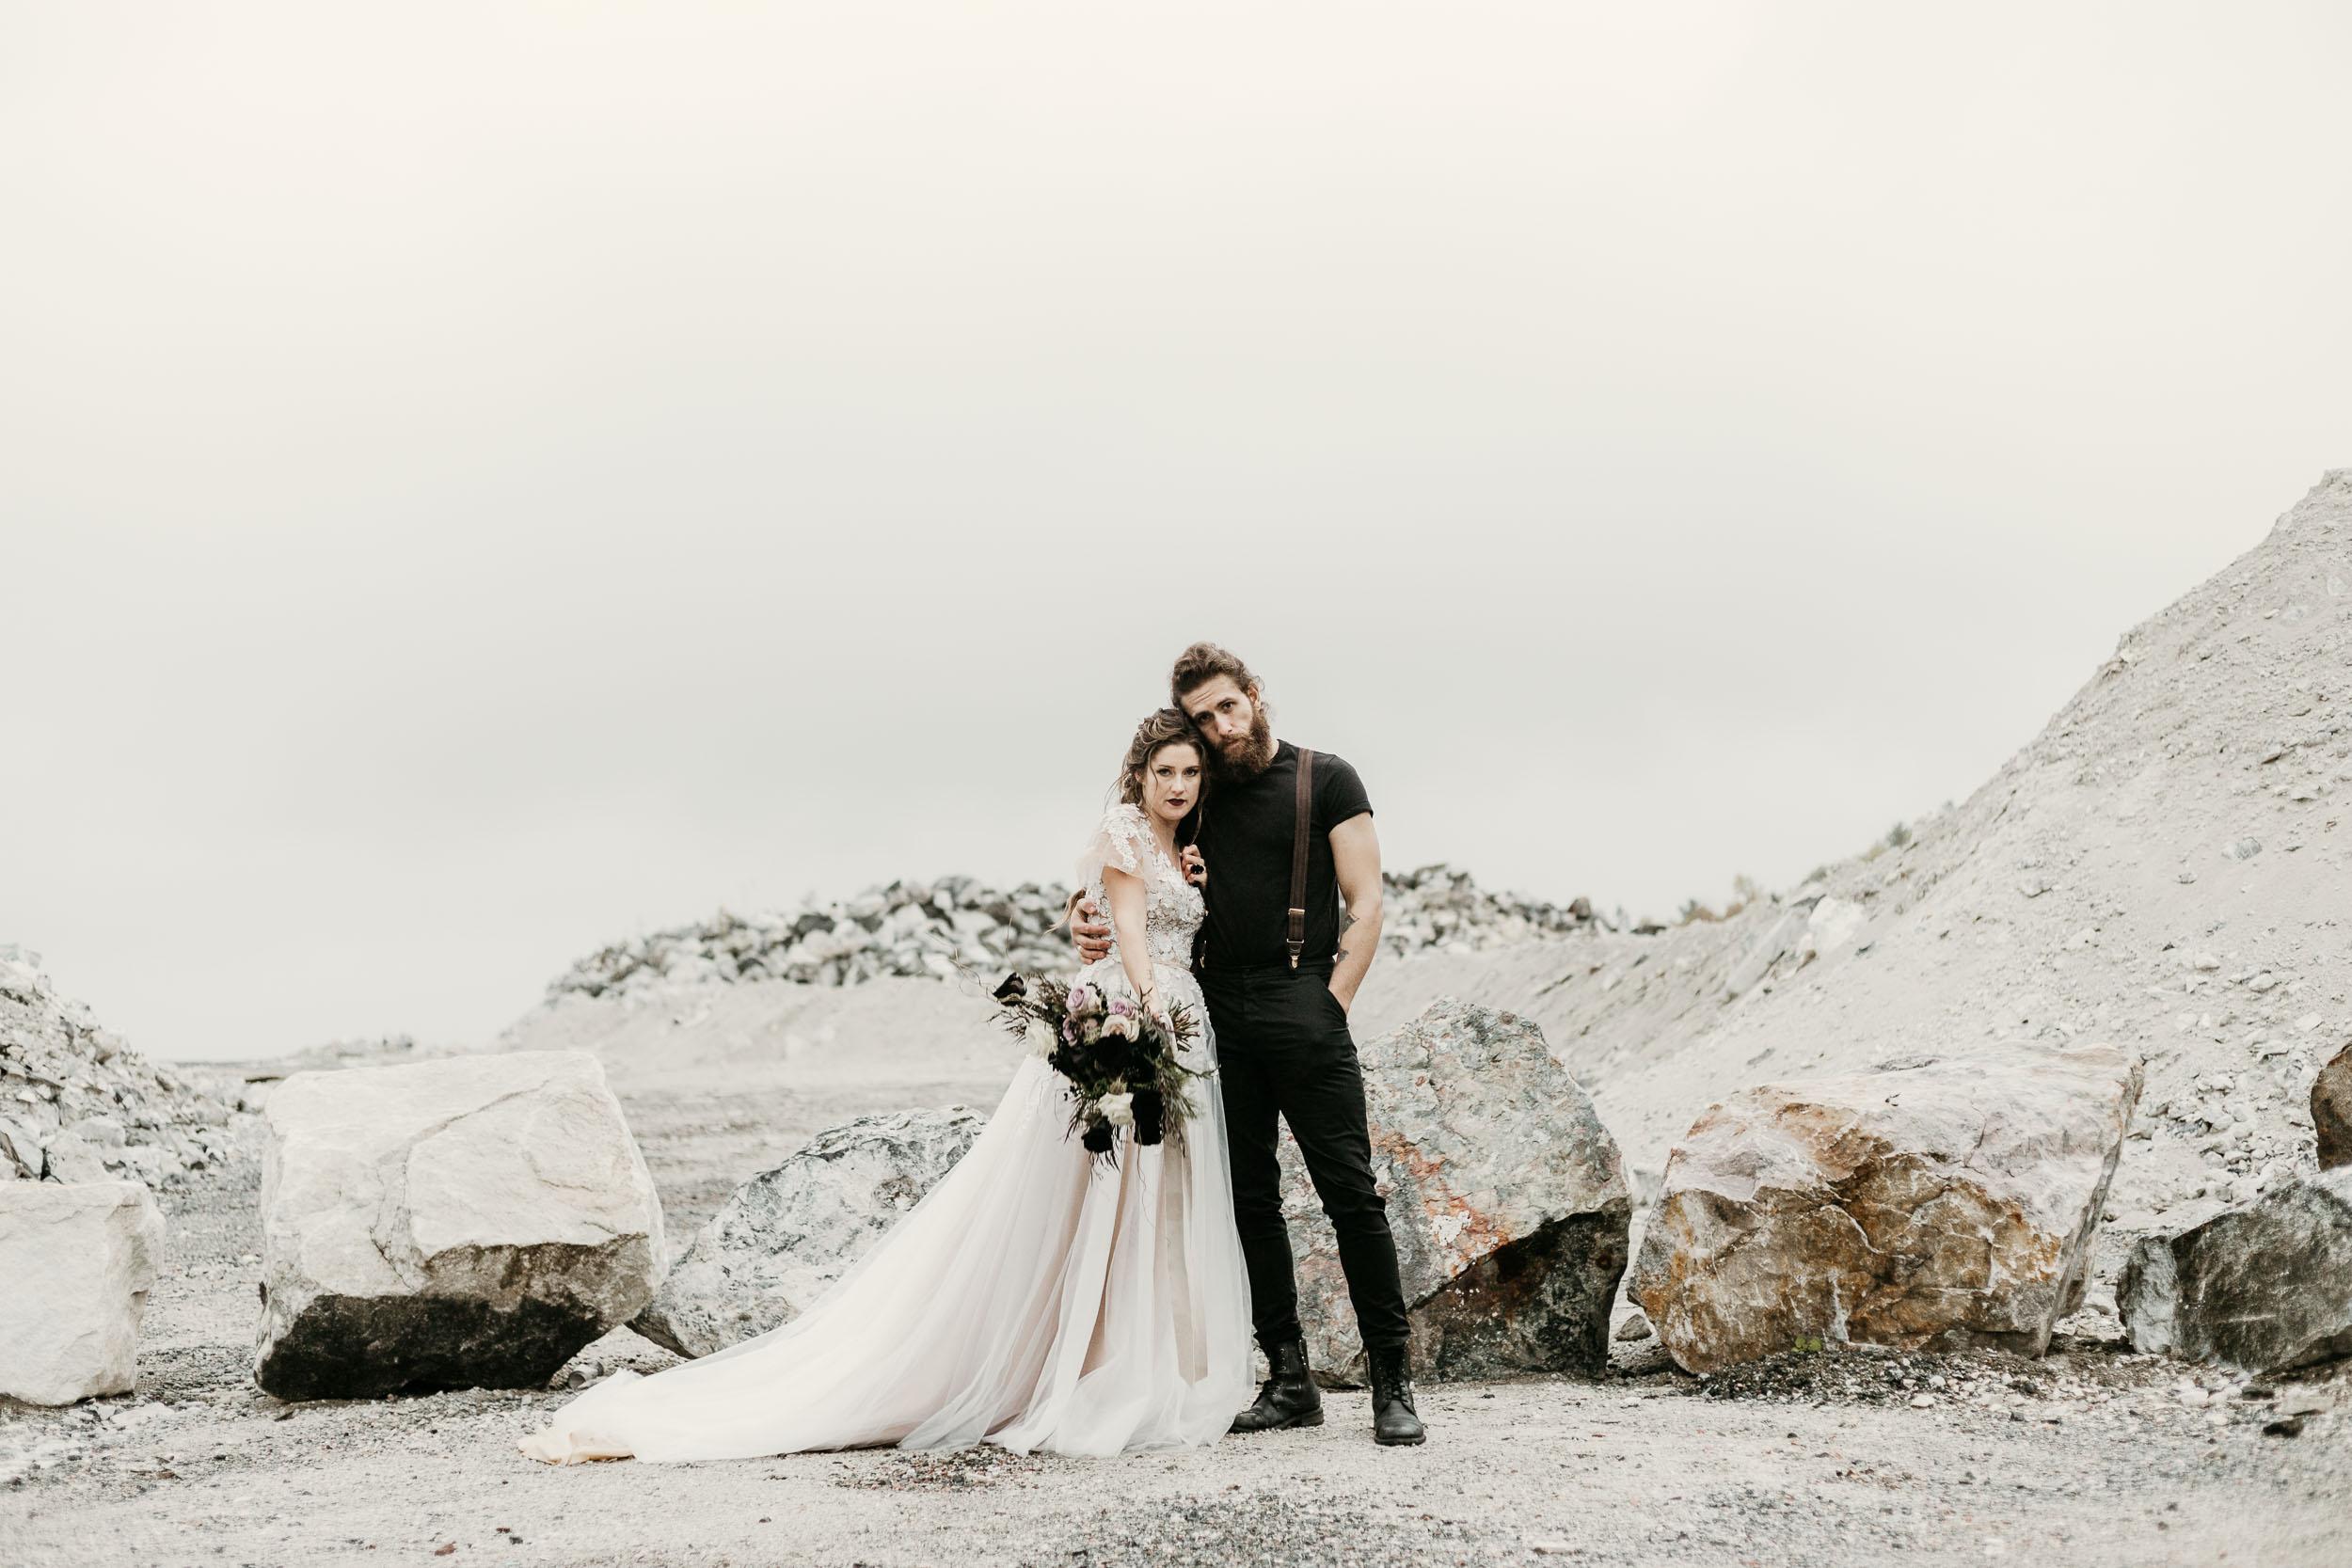 intimate-wedding-elopement-photographer-ottawa-toronto-1044.jpg